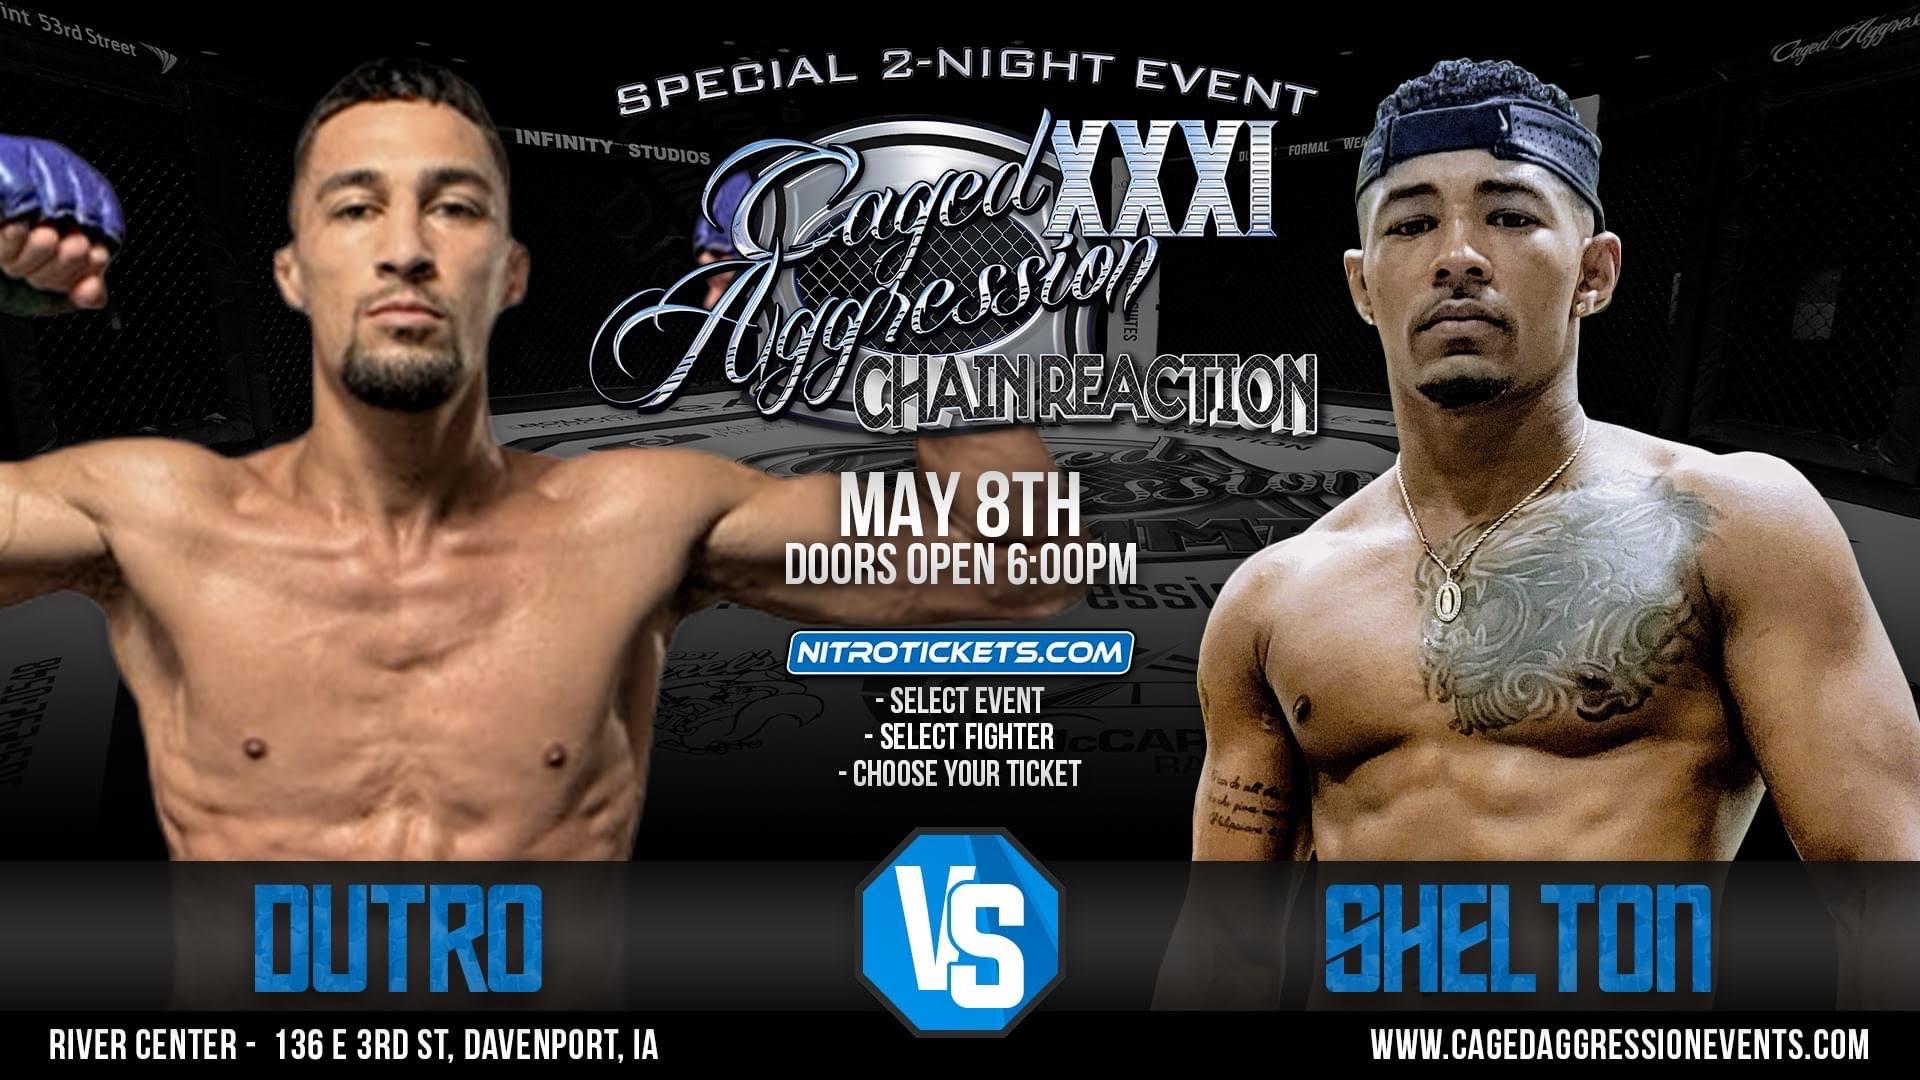 Maui MMA Fighter Riley Dutro Upcoming Fight